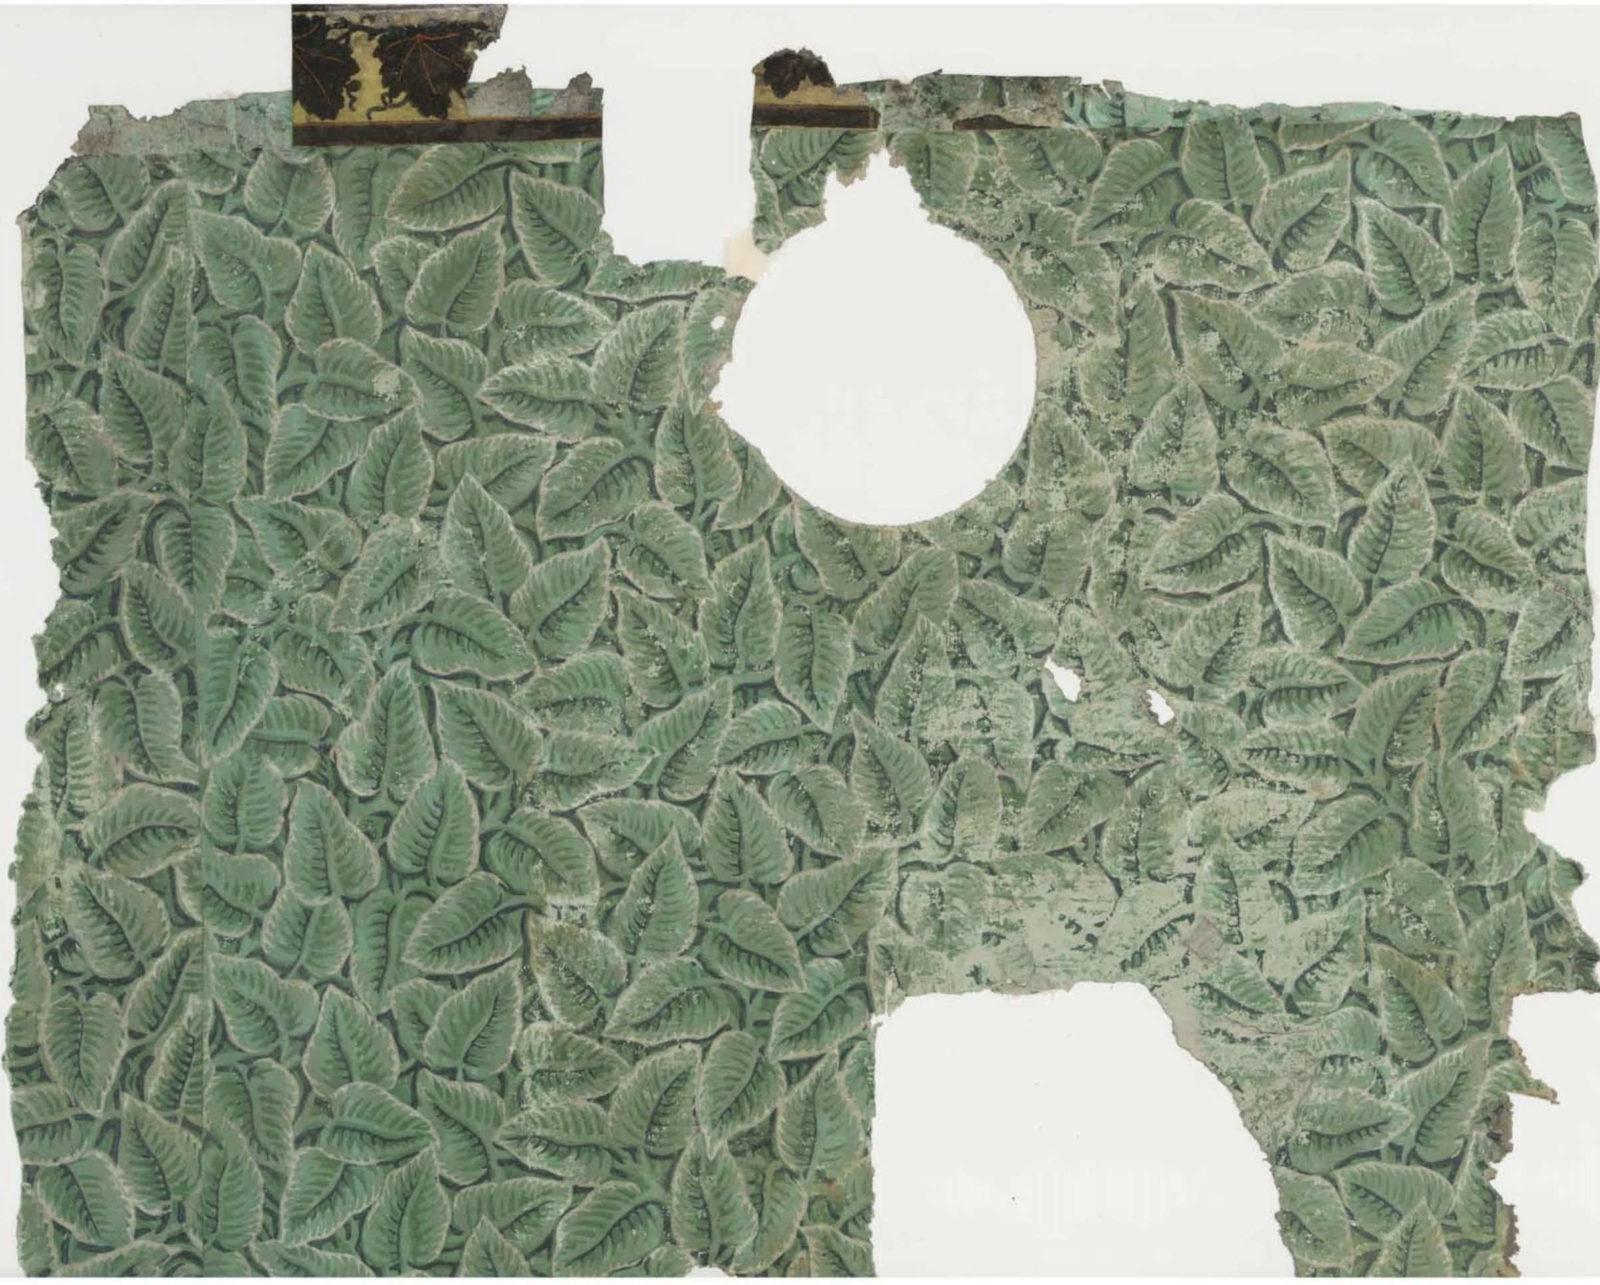 Dining Parlour wallpaper fragment at Jane Austen's House